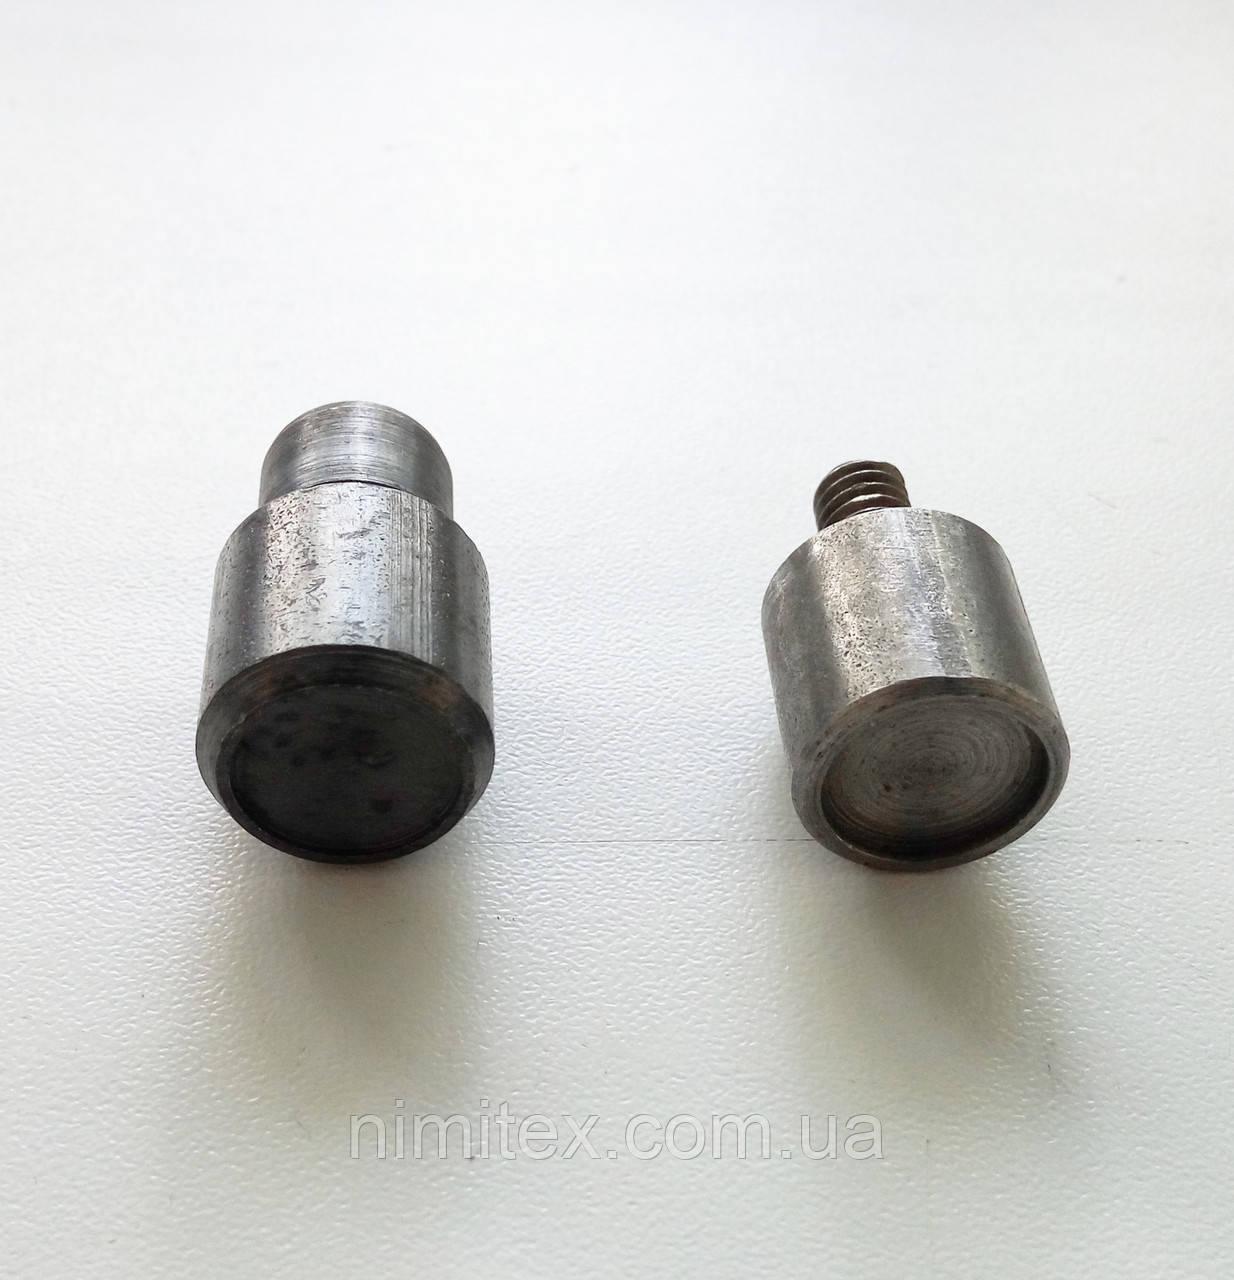 Матрица на хольнитен двусторонний 11 мм